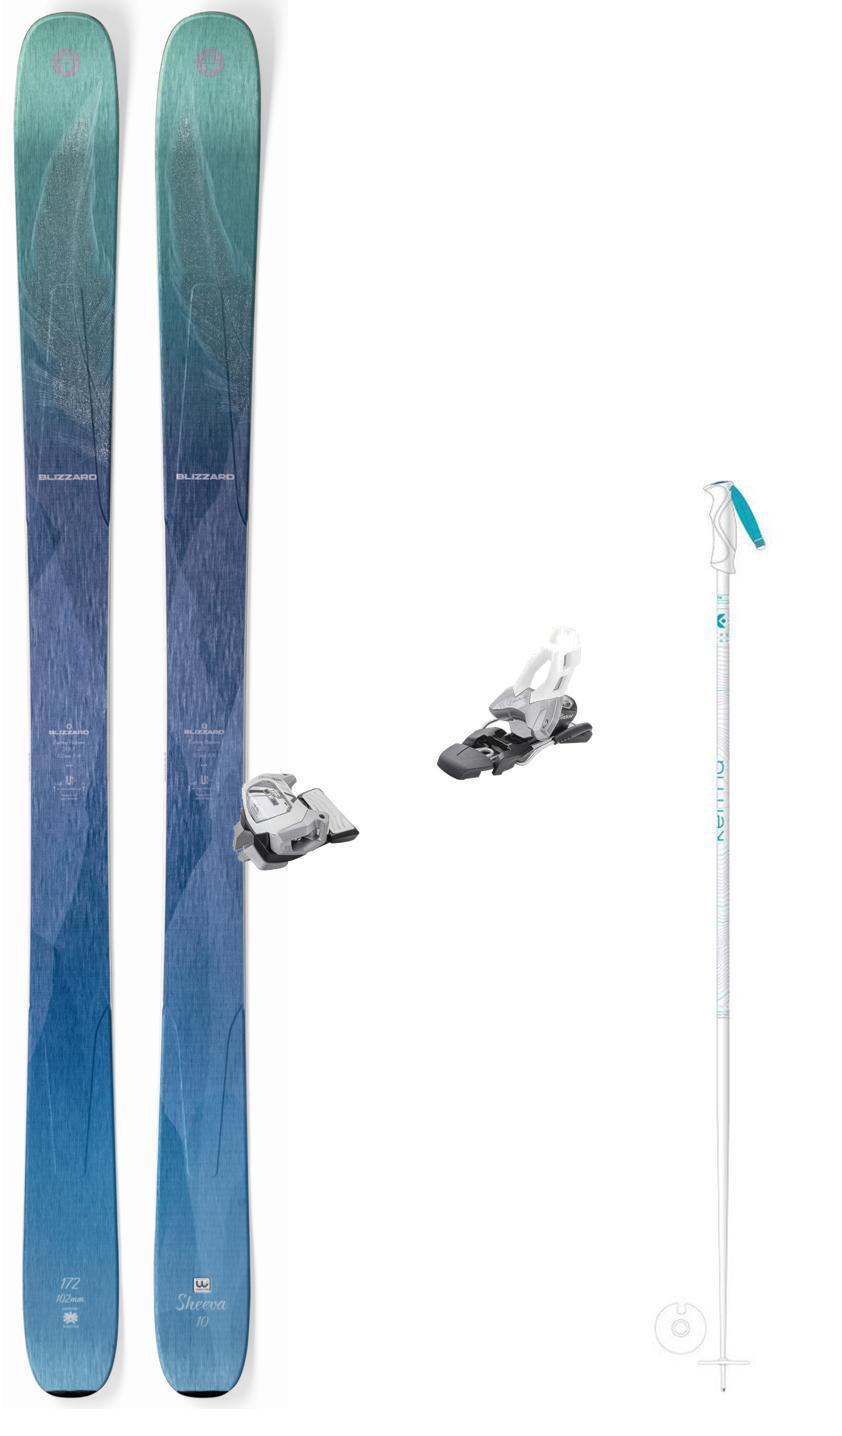 Blizzard Sheeva 10 ladies' snow skis 164cm w-bind (incl POLES at BuyItNOW) 2019